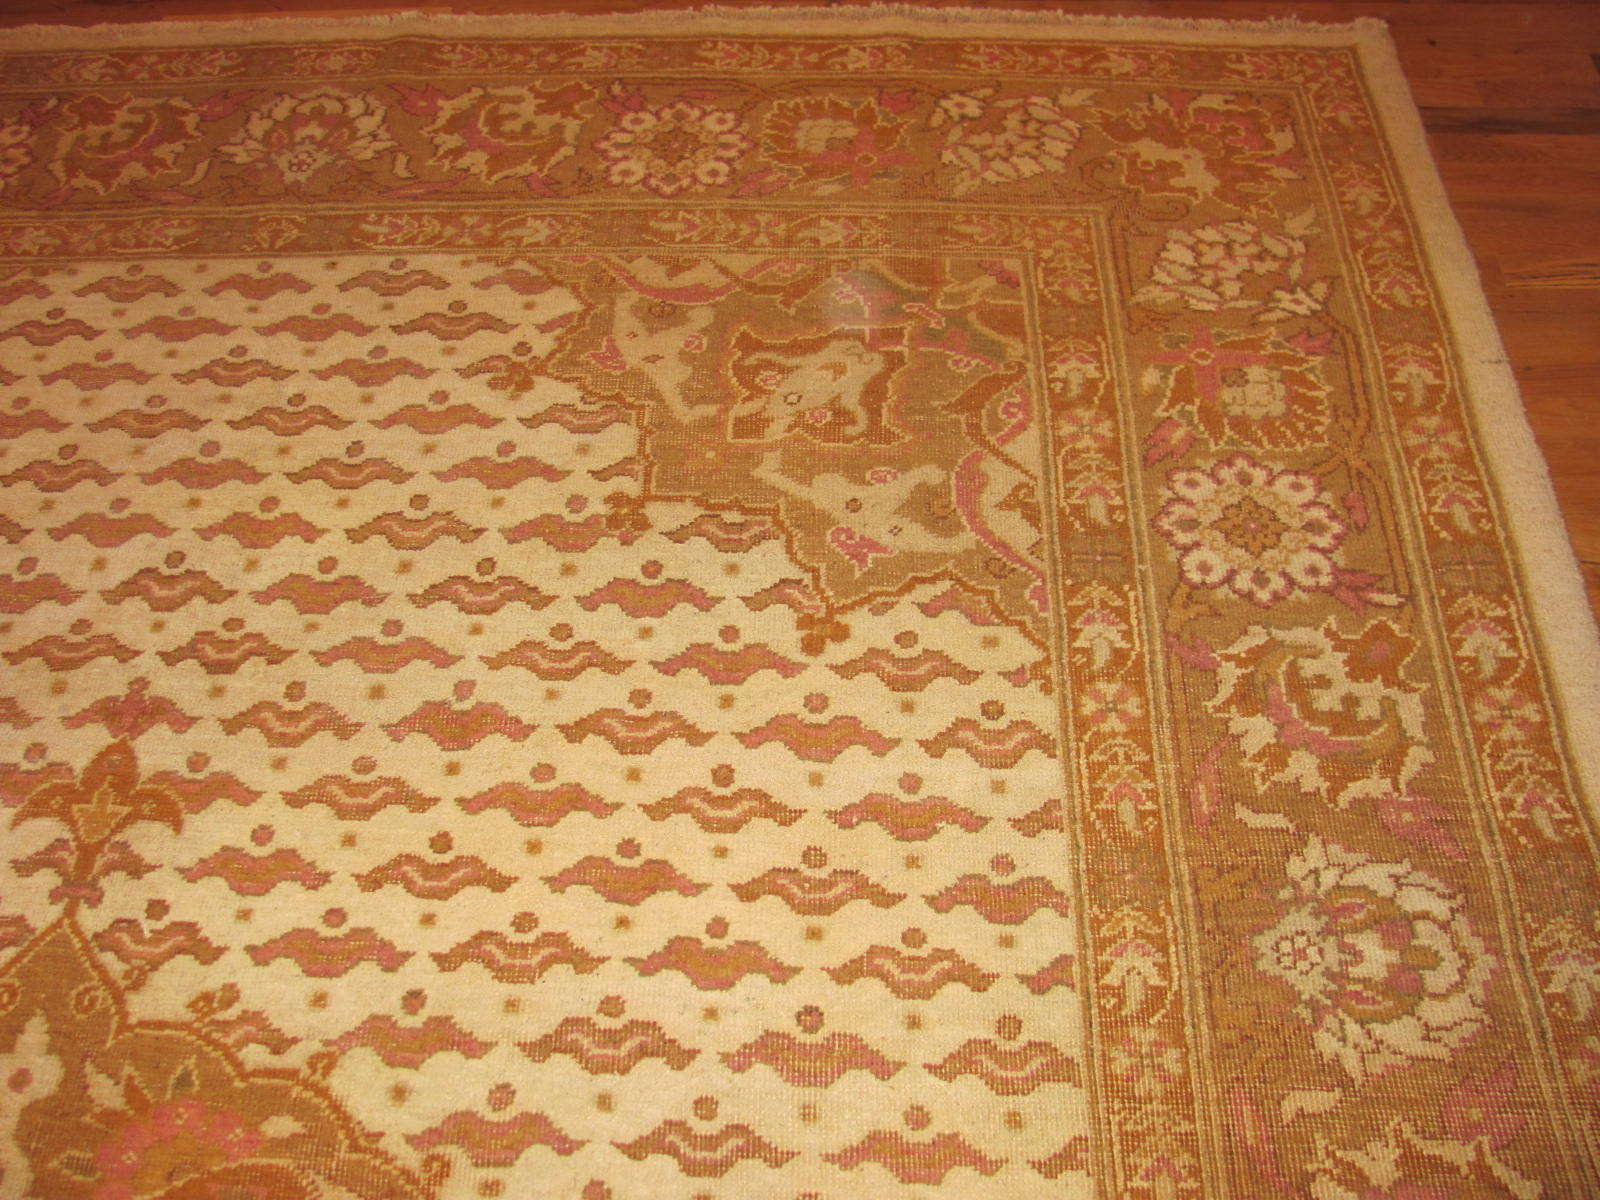 24418 antique Indian Amritsar 8,10 x 11,6 -1